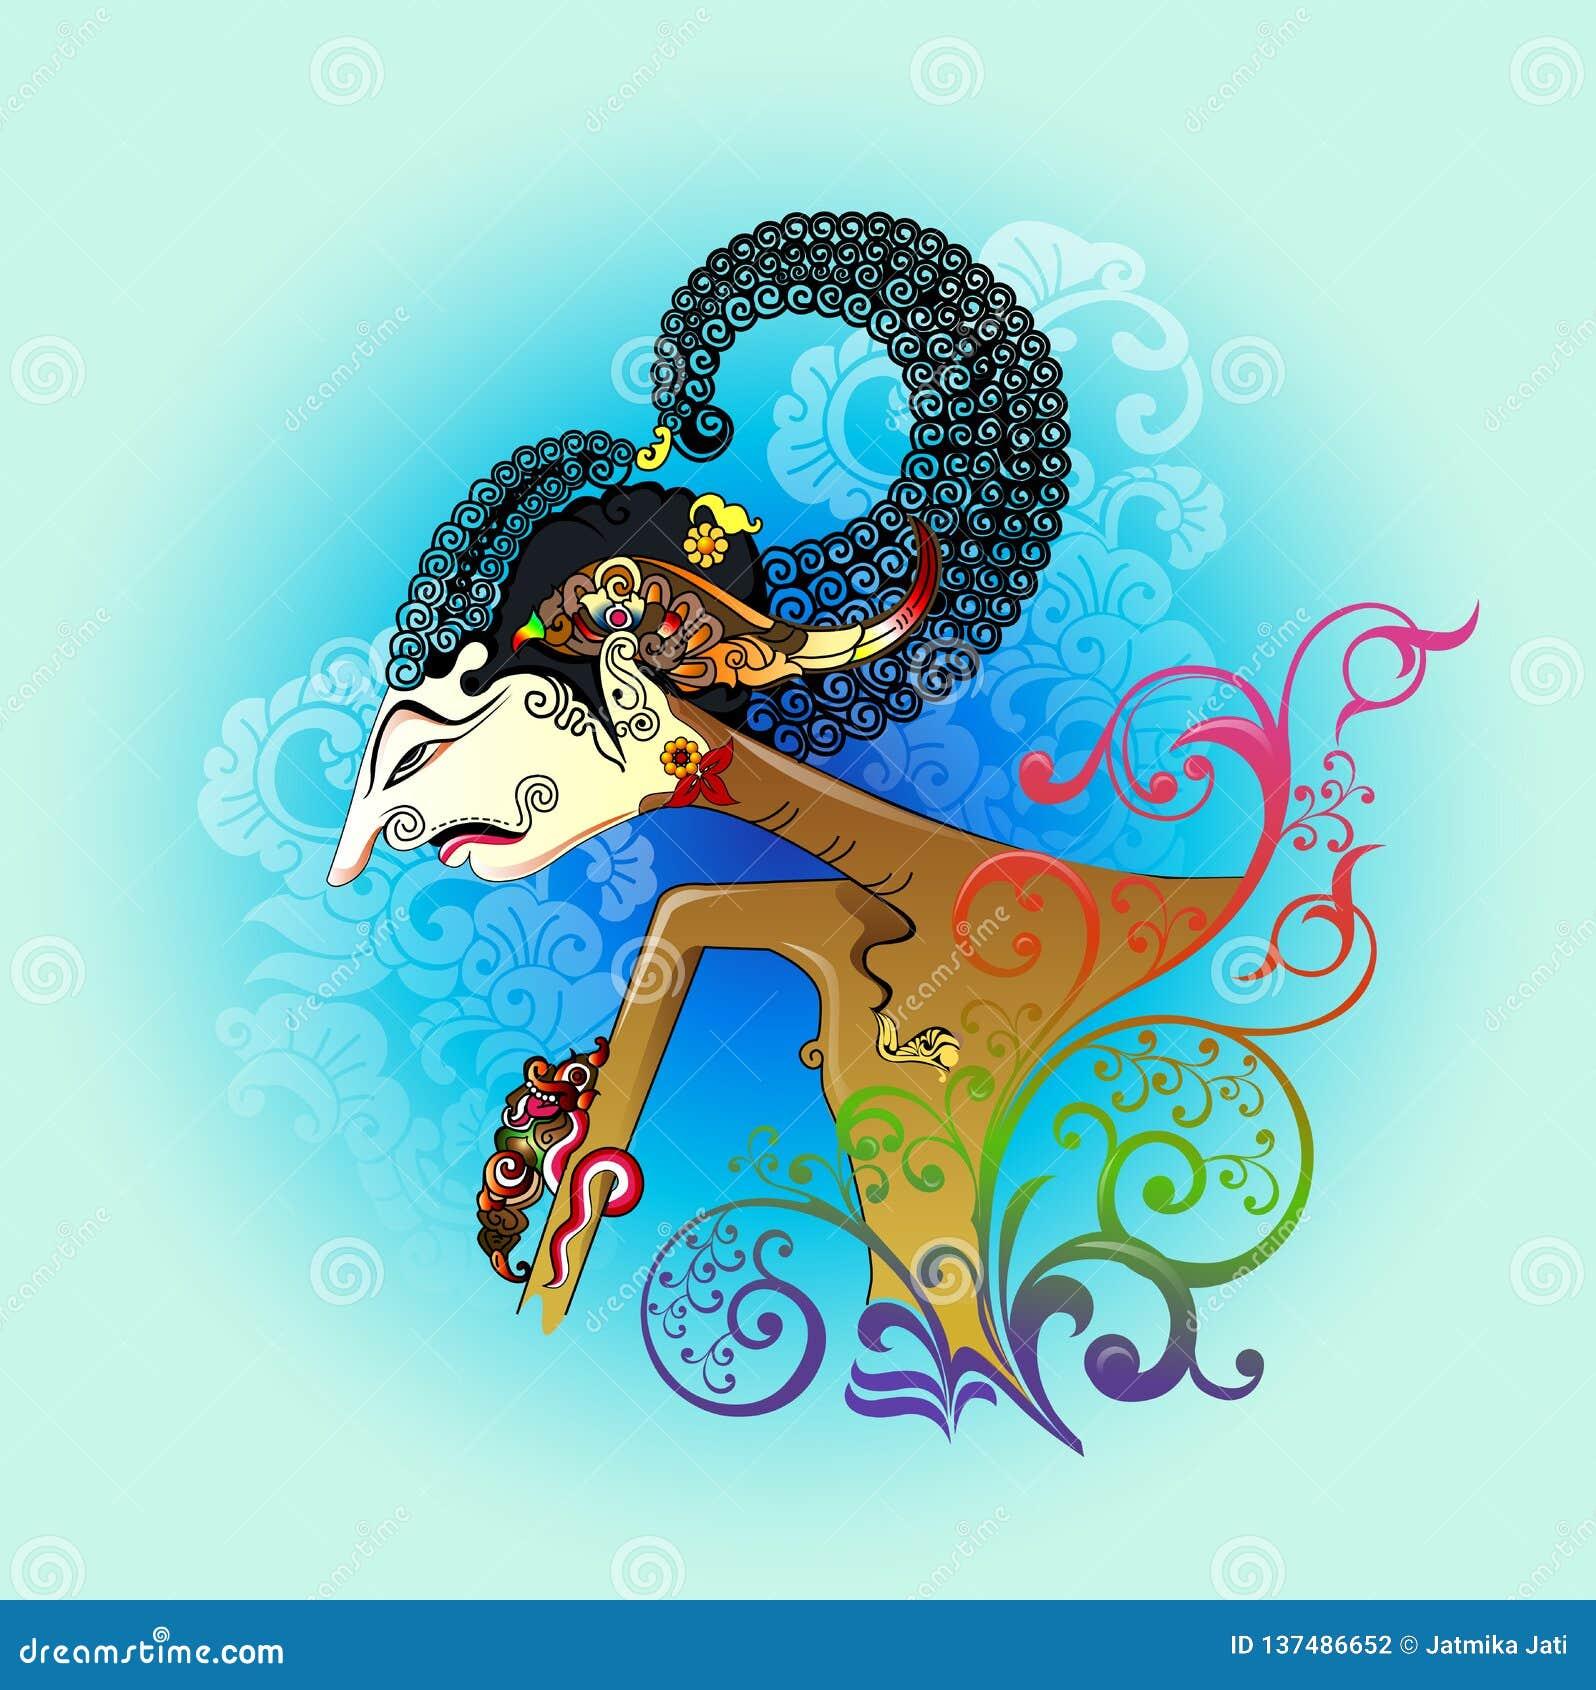 Arjuna Wayang Stock Illustrations 124 Arjuna Wayang Stock Illustrations Vectors Clipart Dreamstime